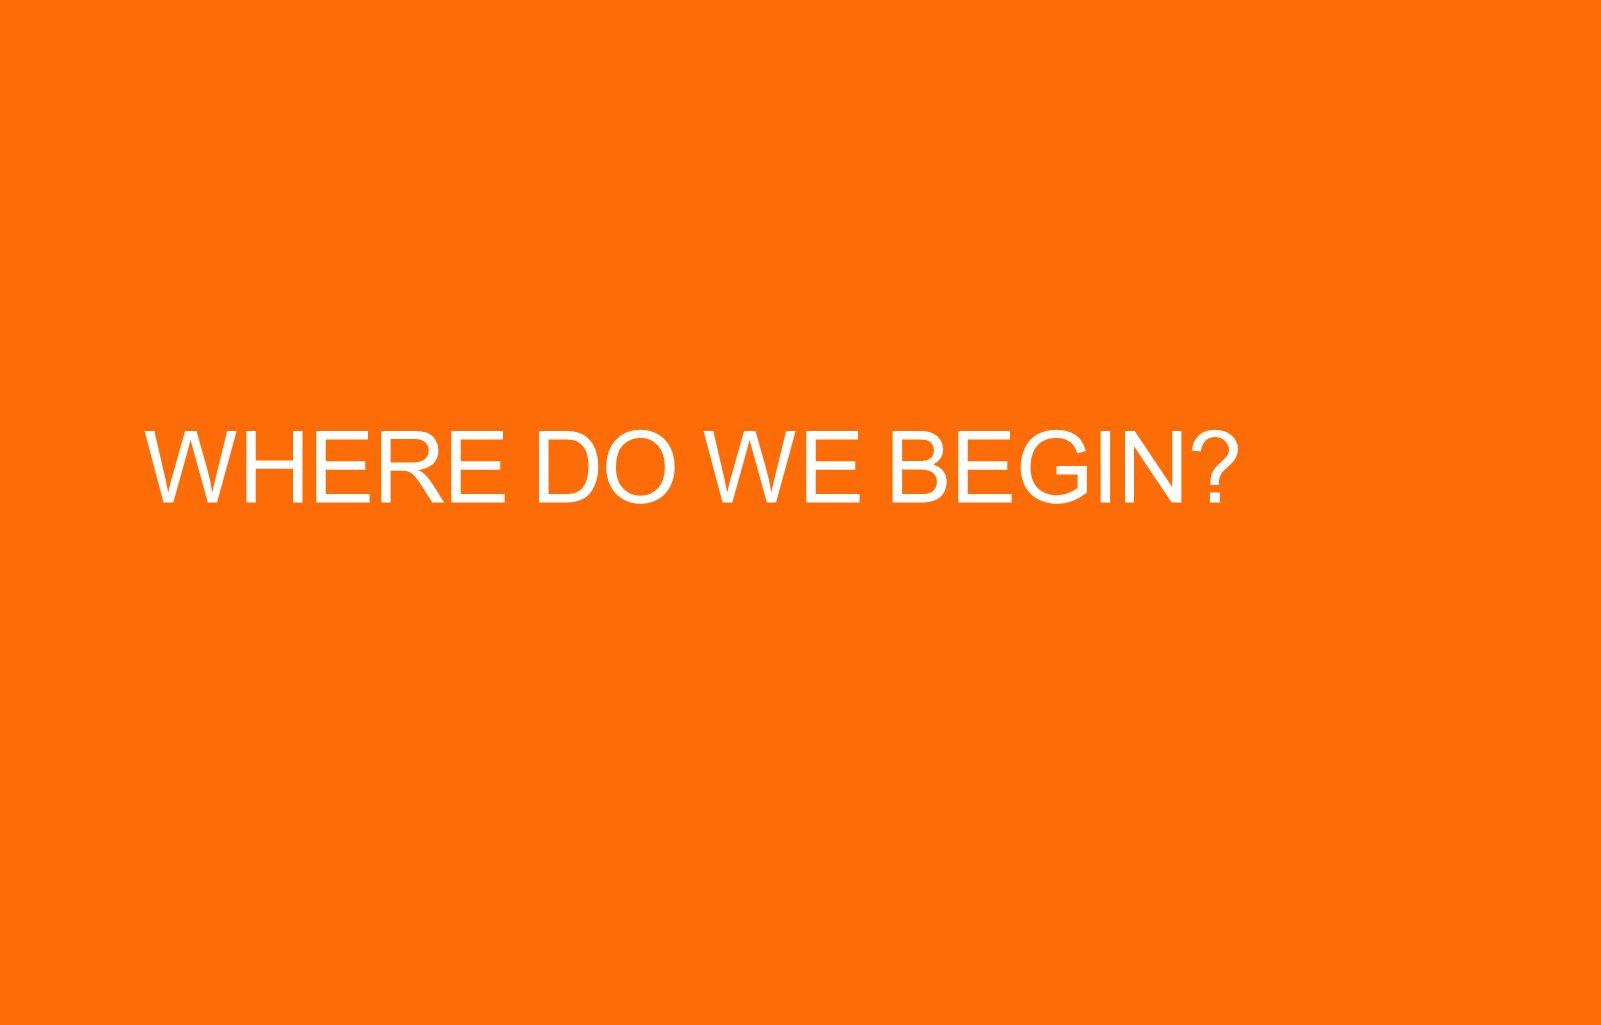 WHERE DO WE BEGIN?